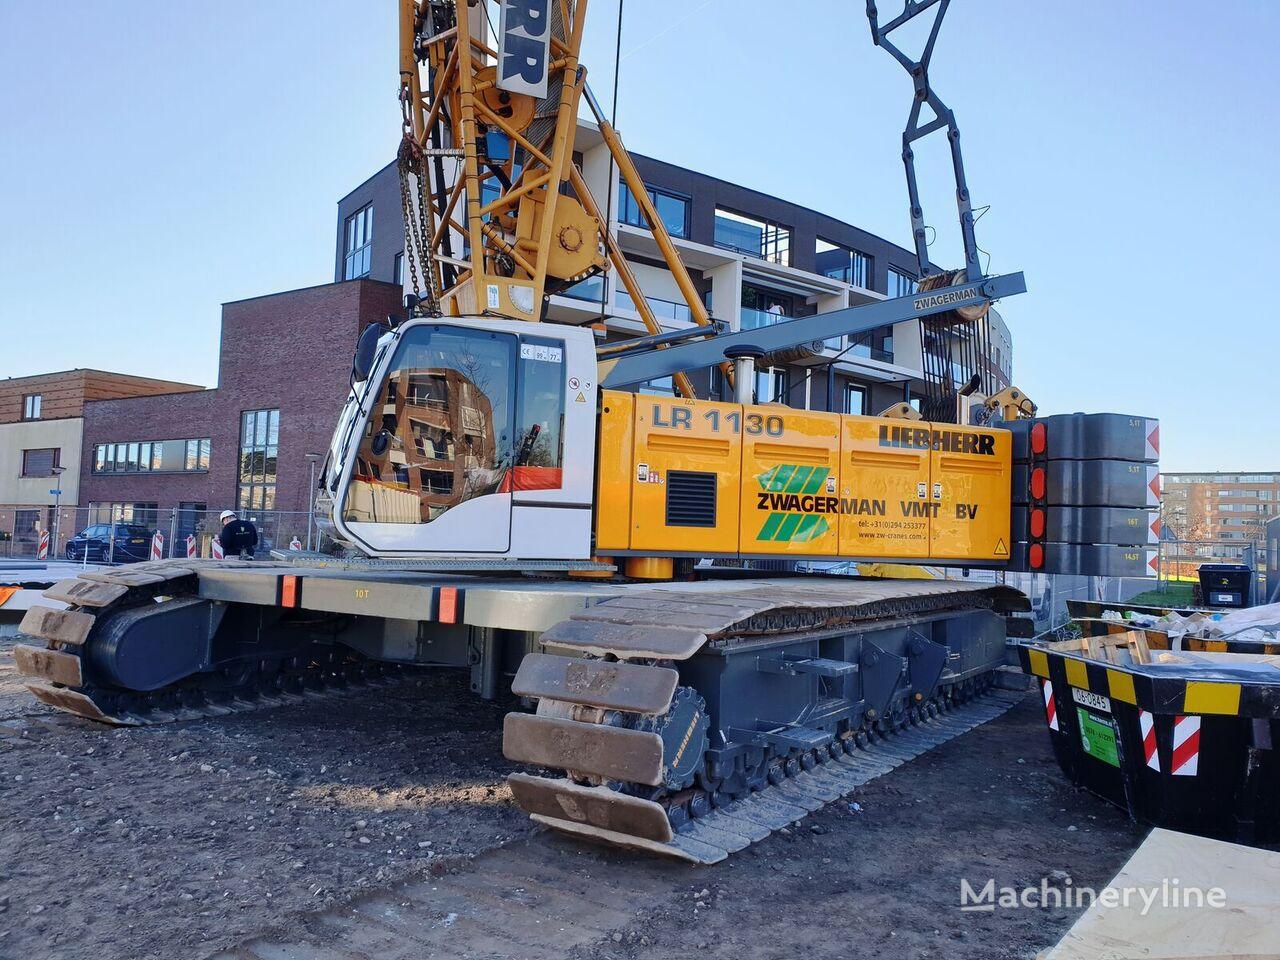 LIEBHERR LR 1130 crawler crane